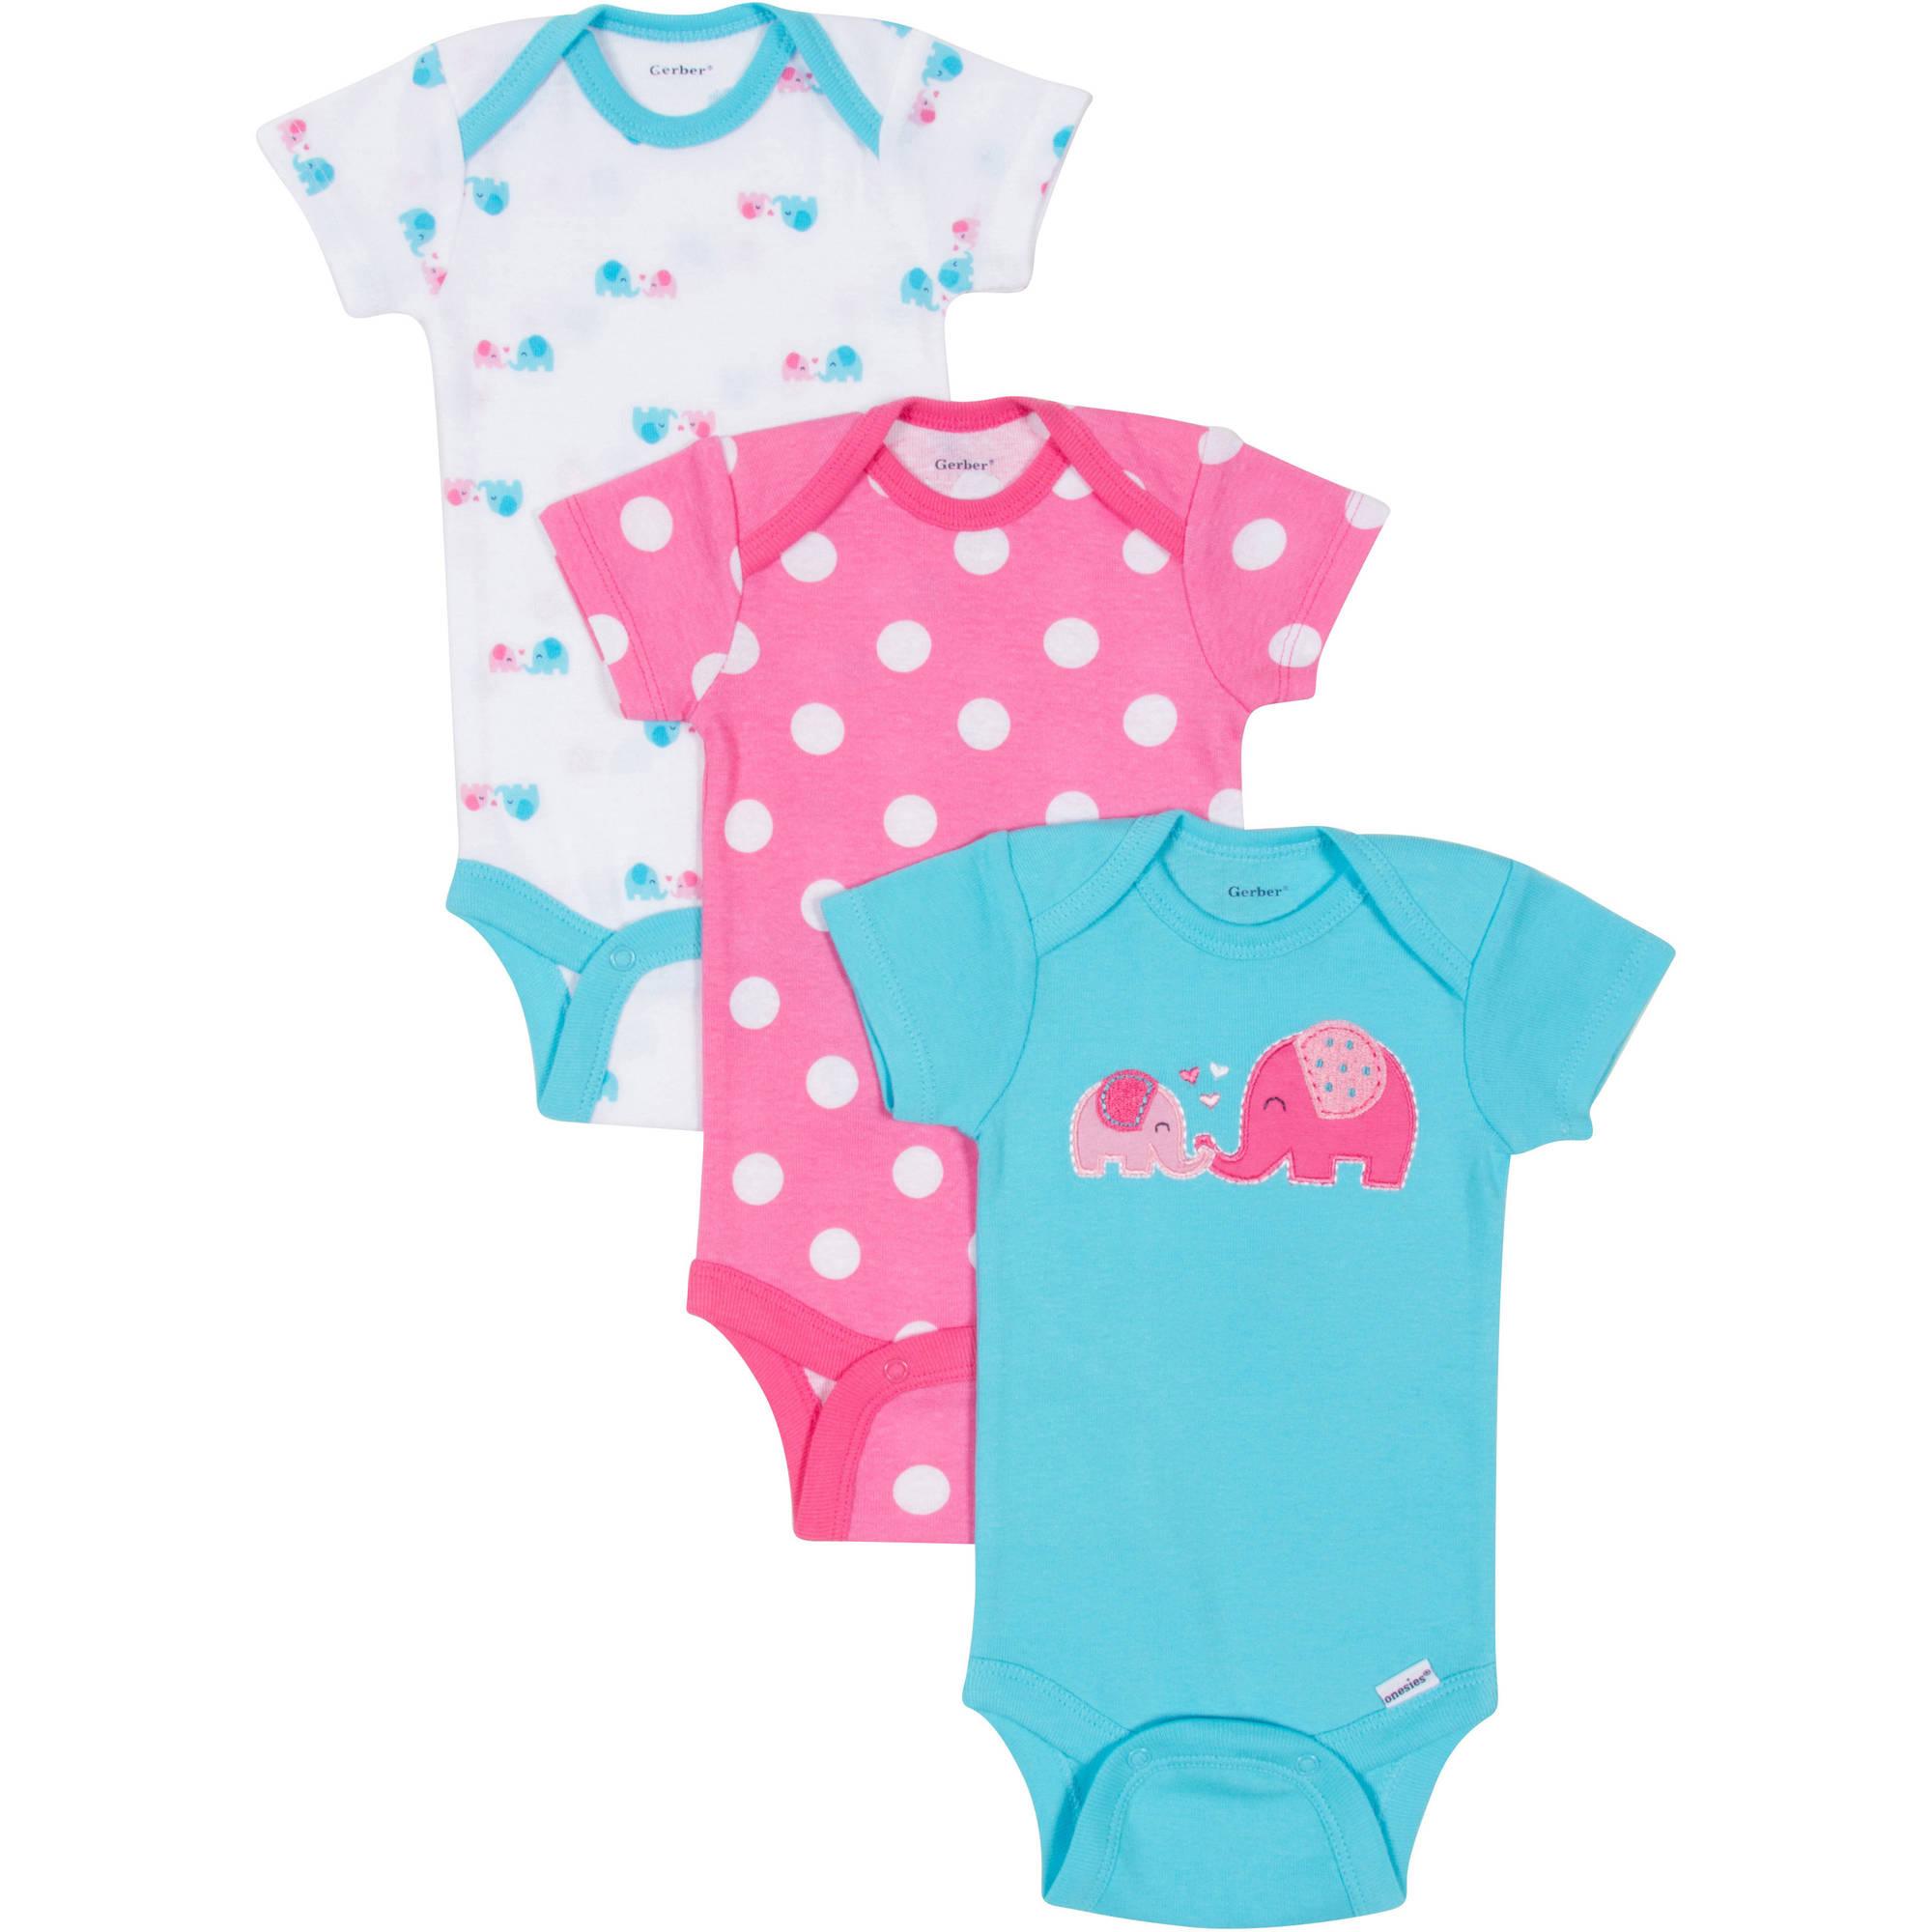 Gerber Newborn Baby Girl Bodysuits Variety, 3-Pack